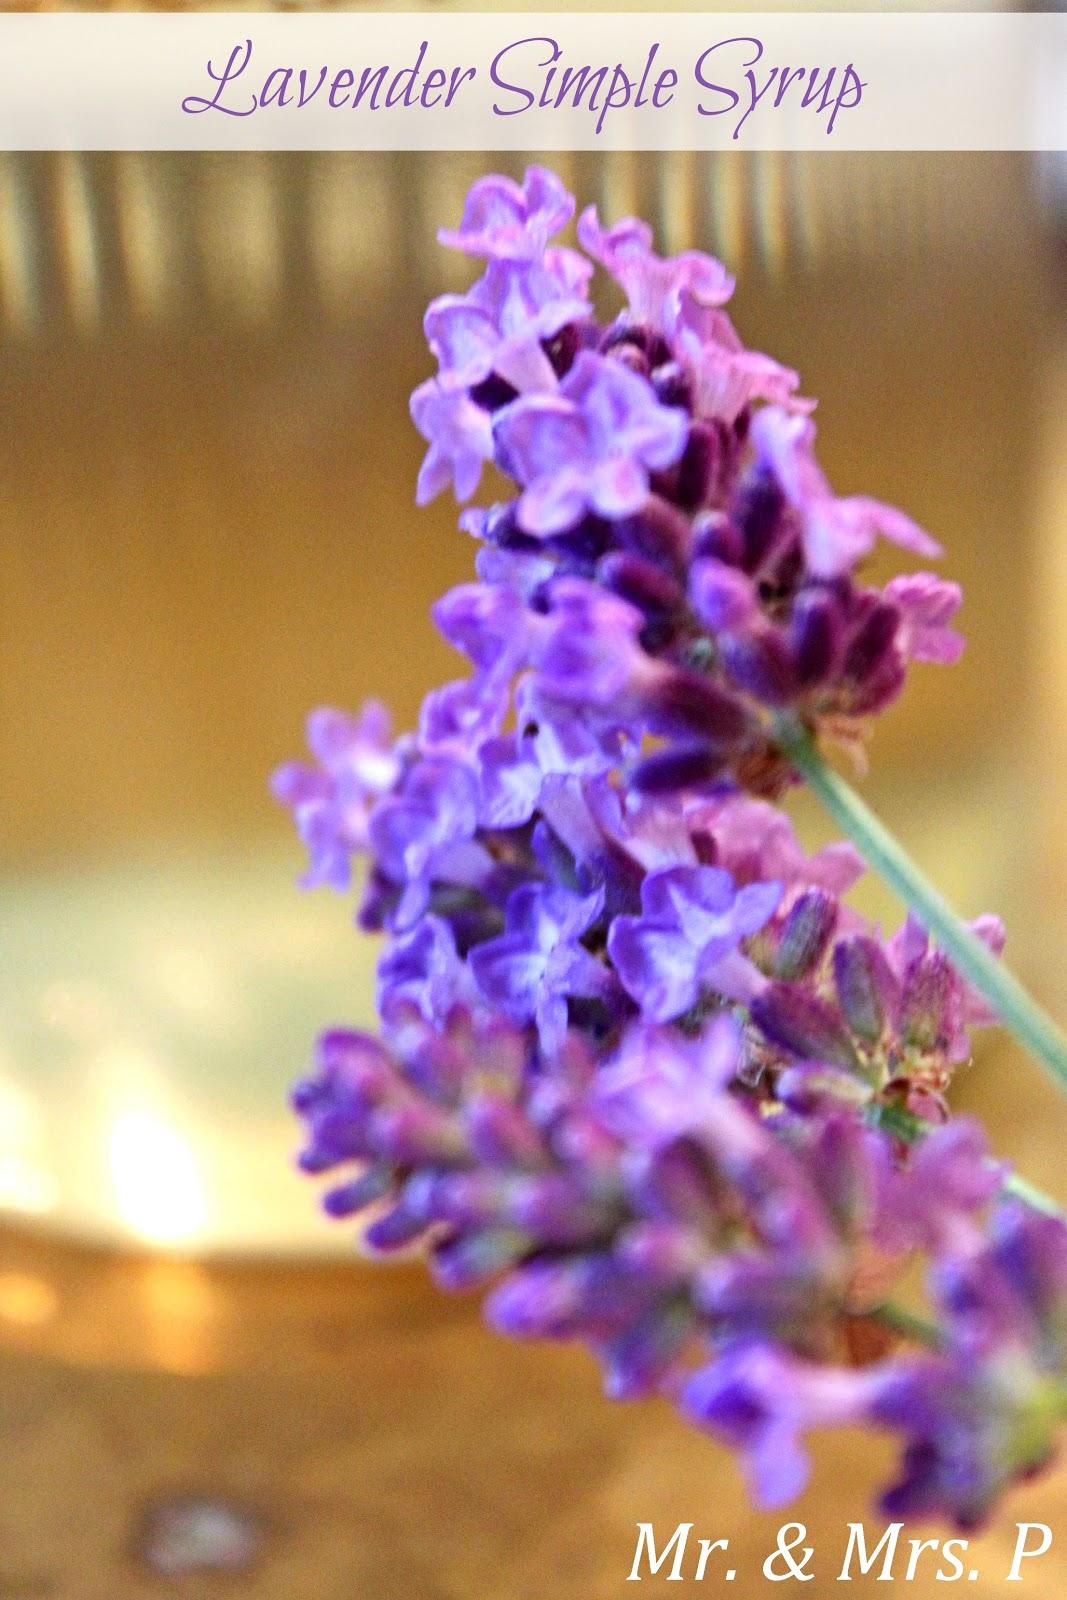 Mr. & Mrs. P: Lavender Simple Syrup